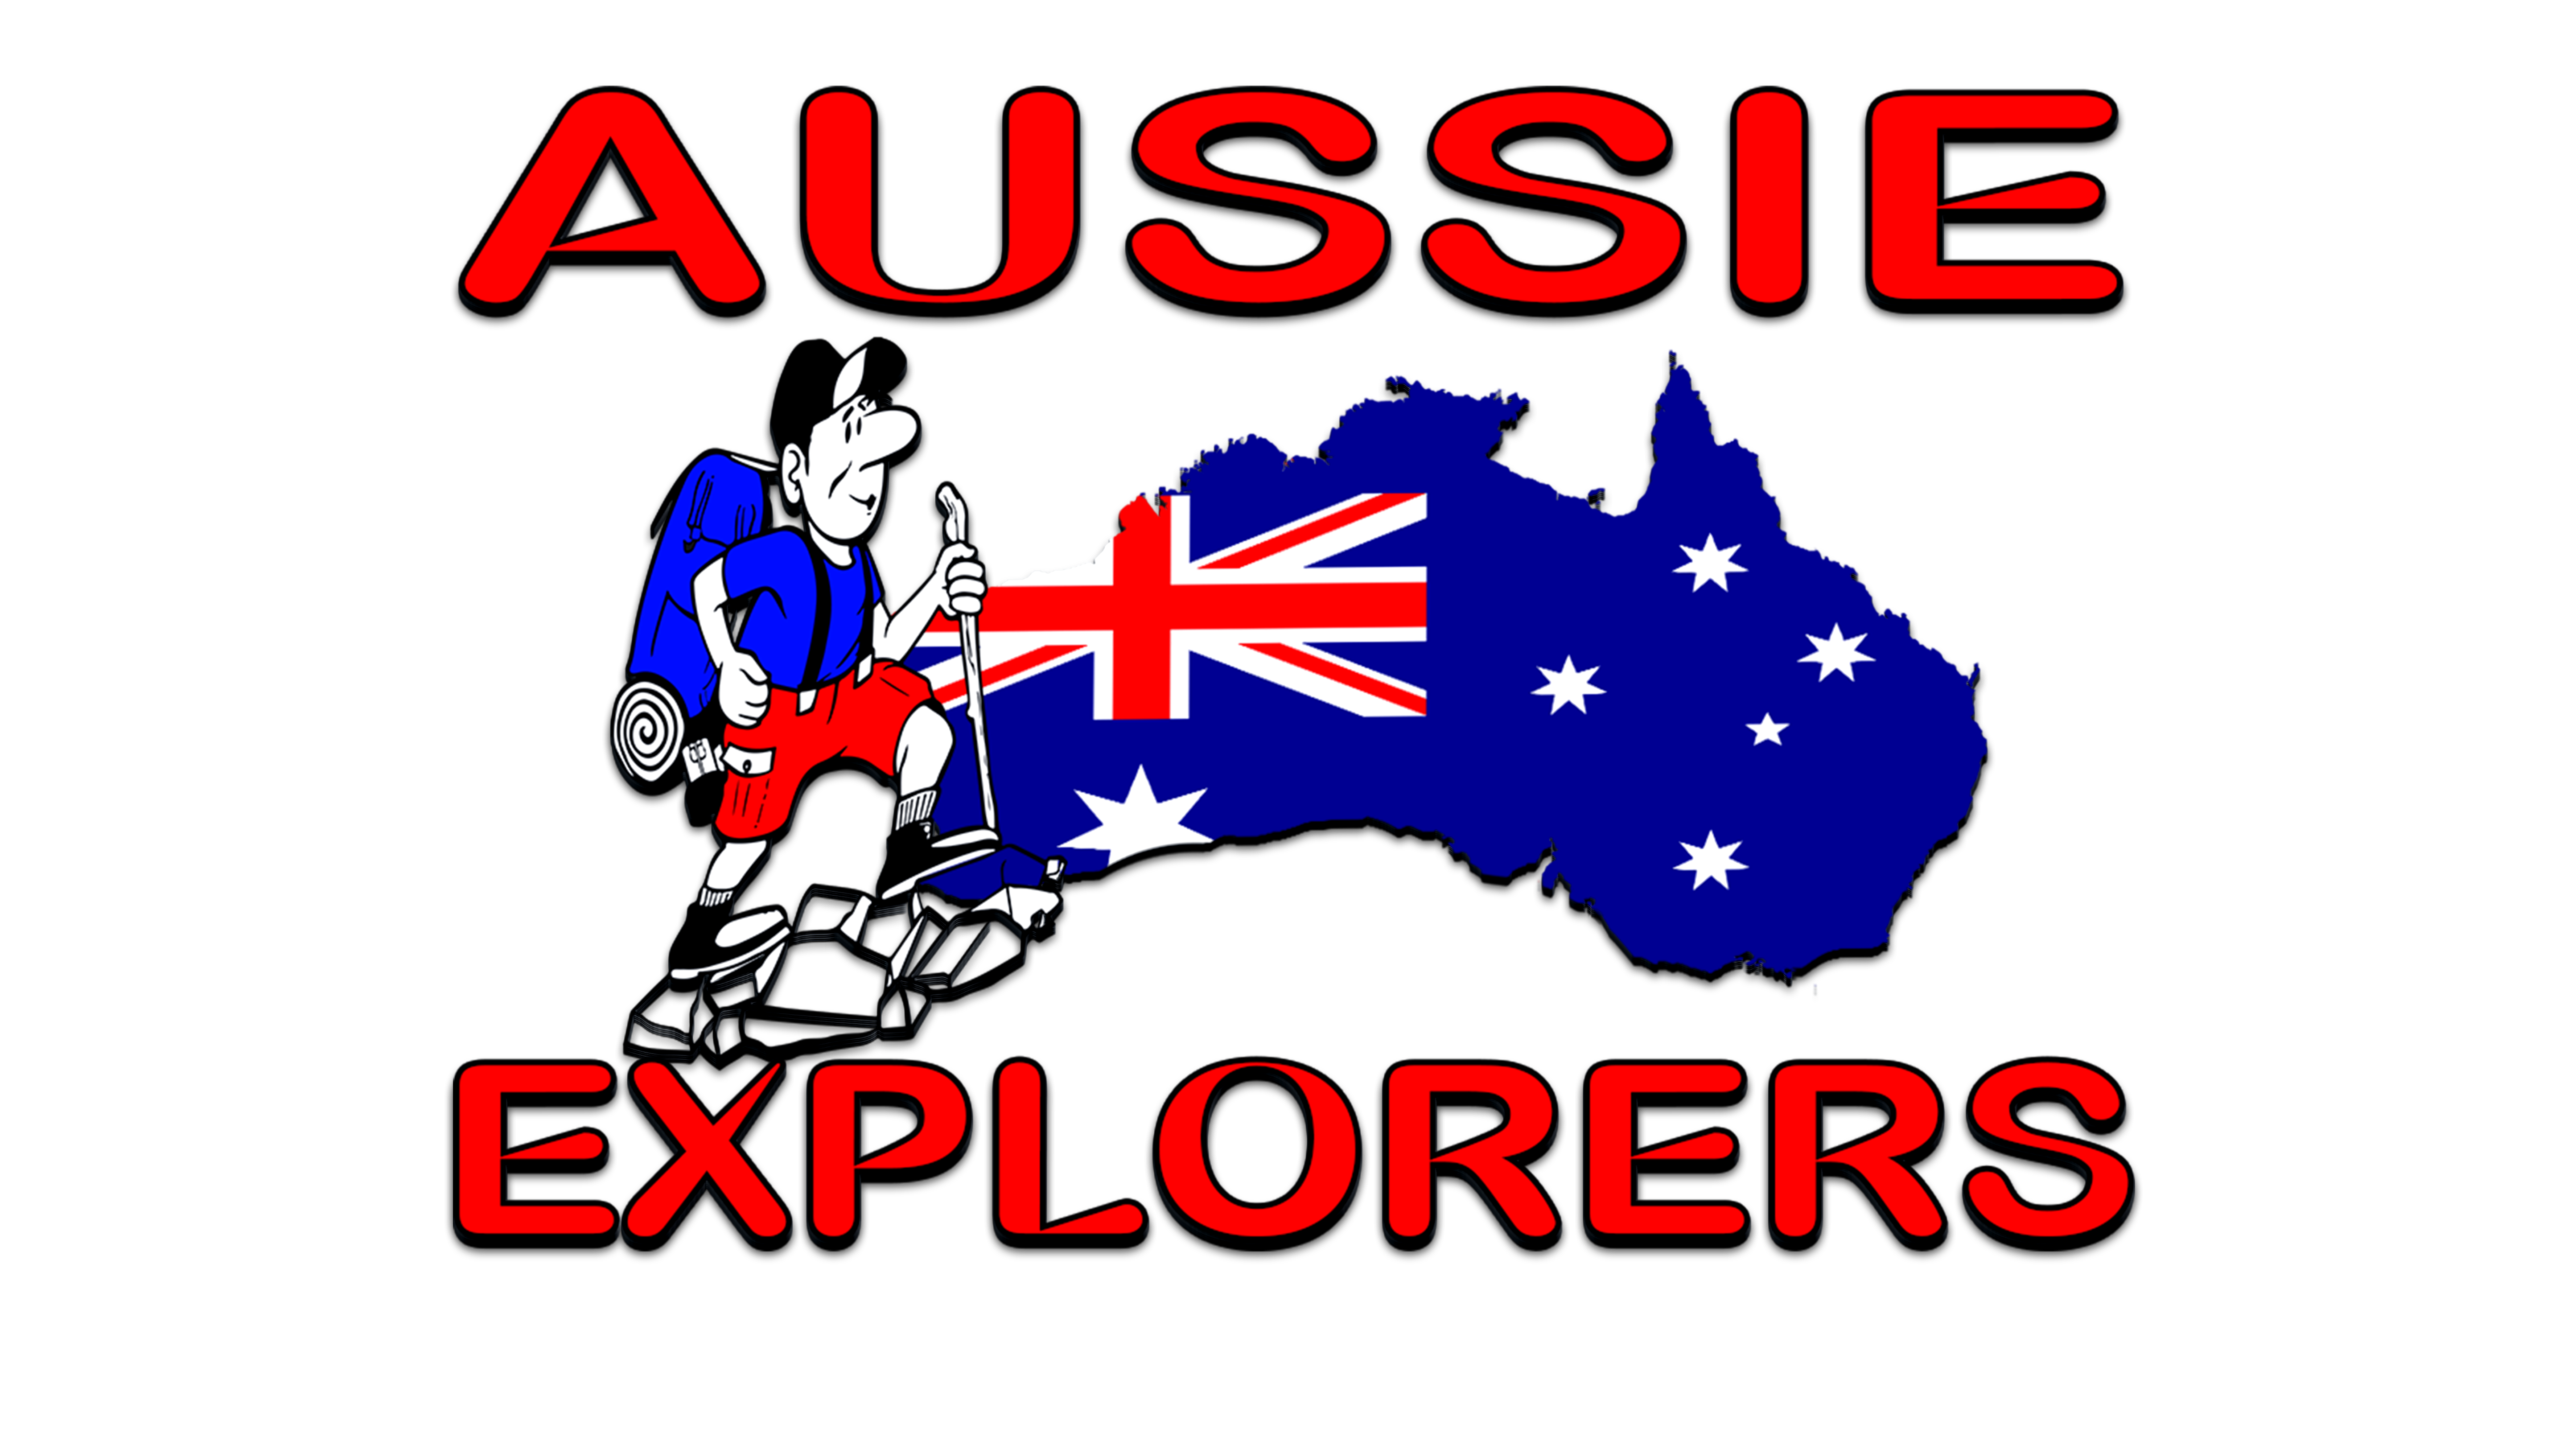 Aussie Explorers